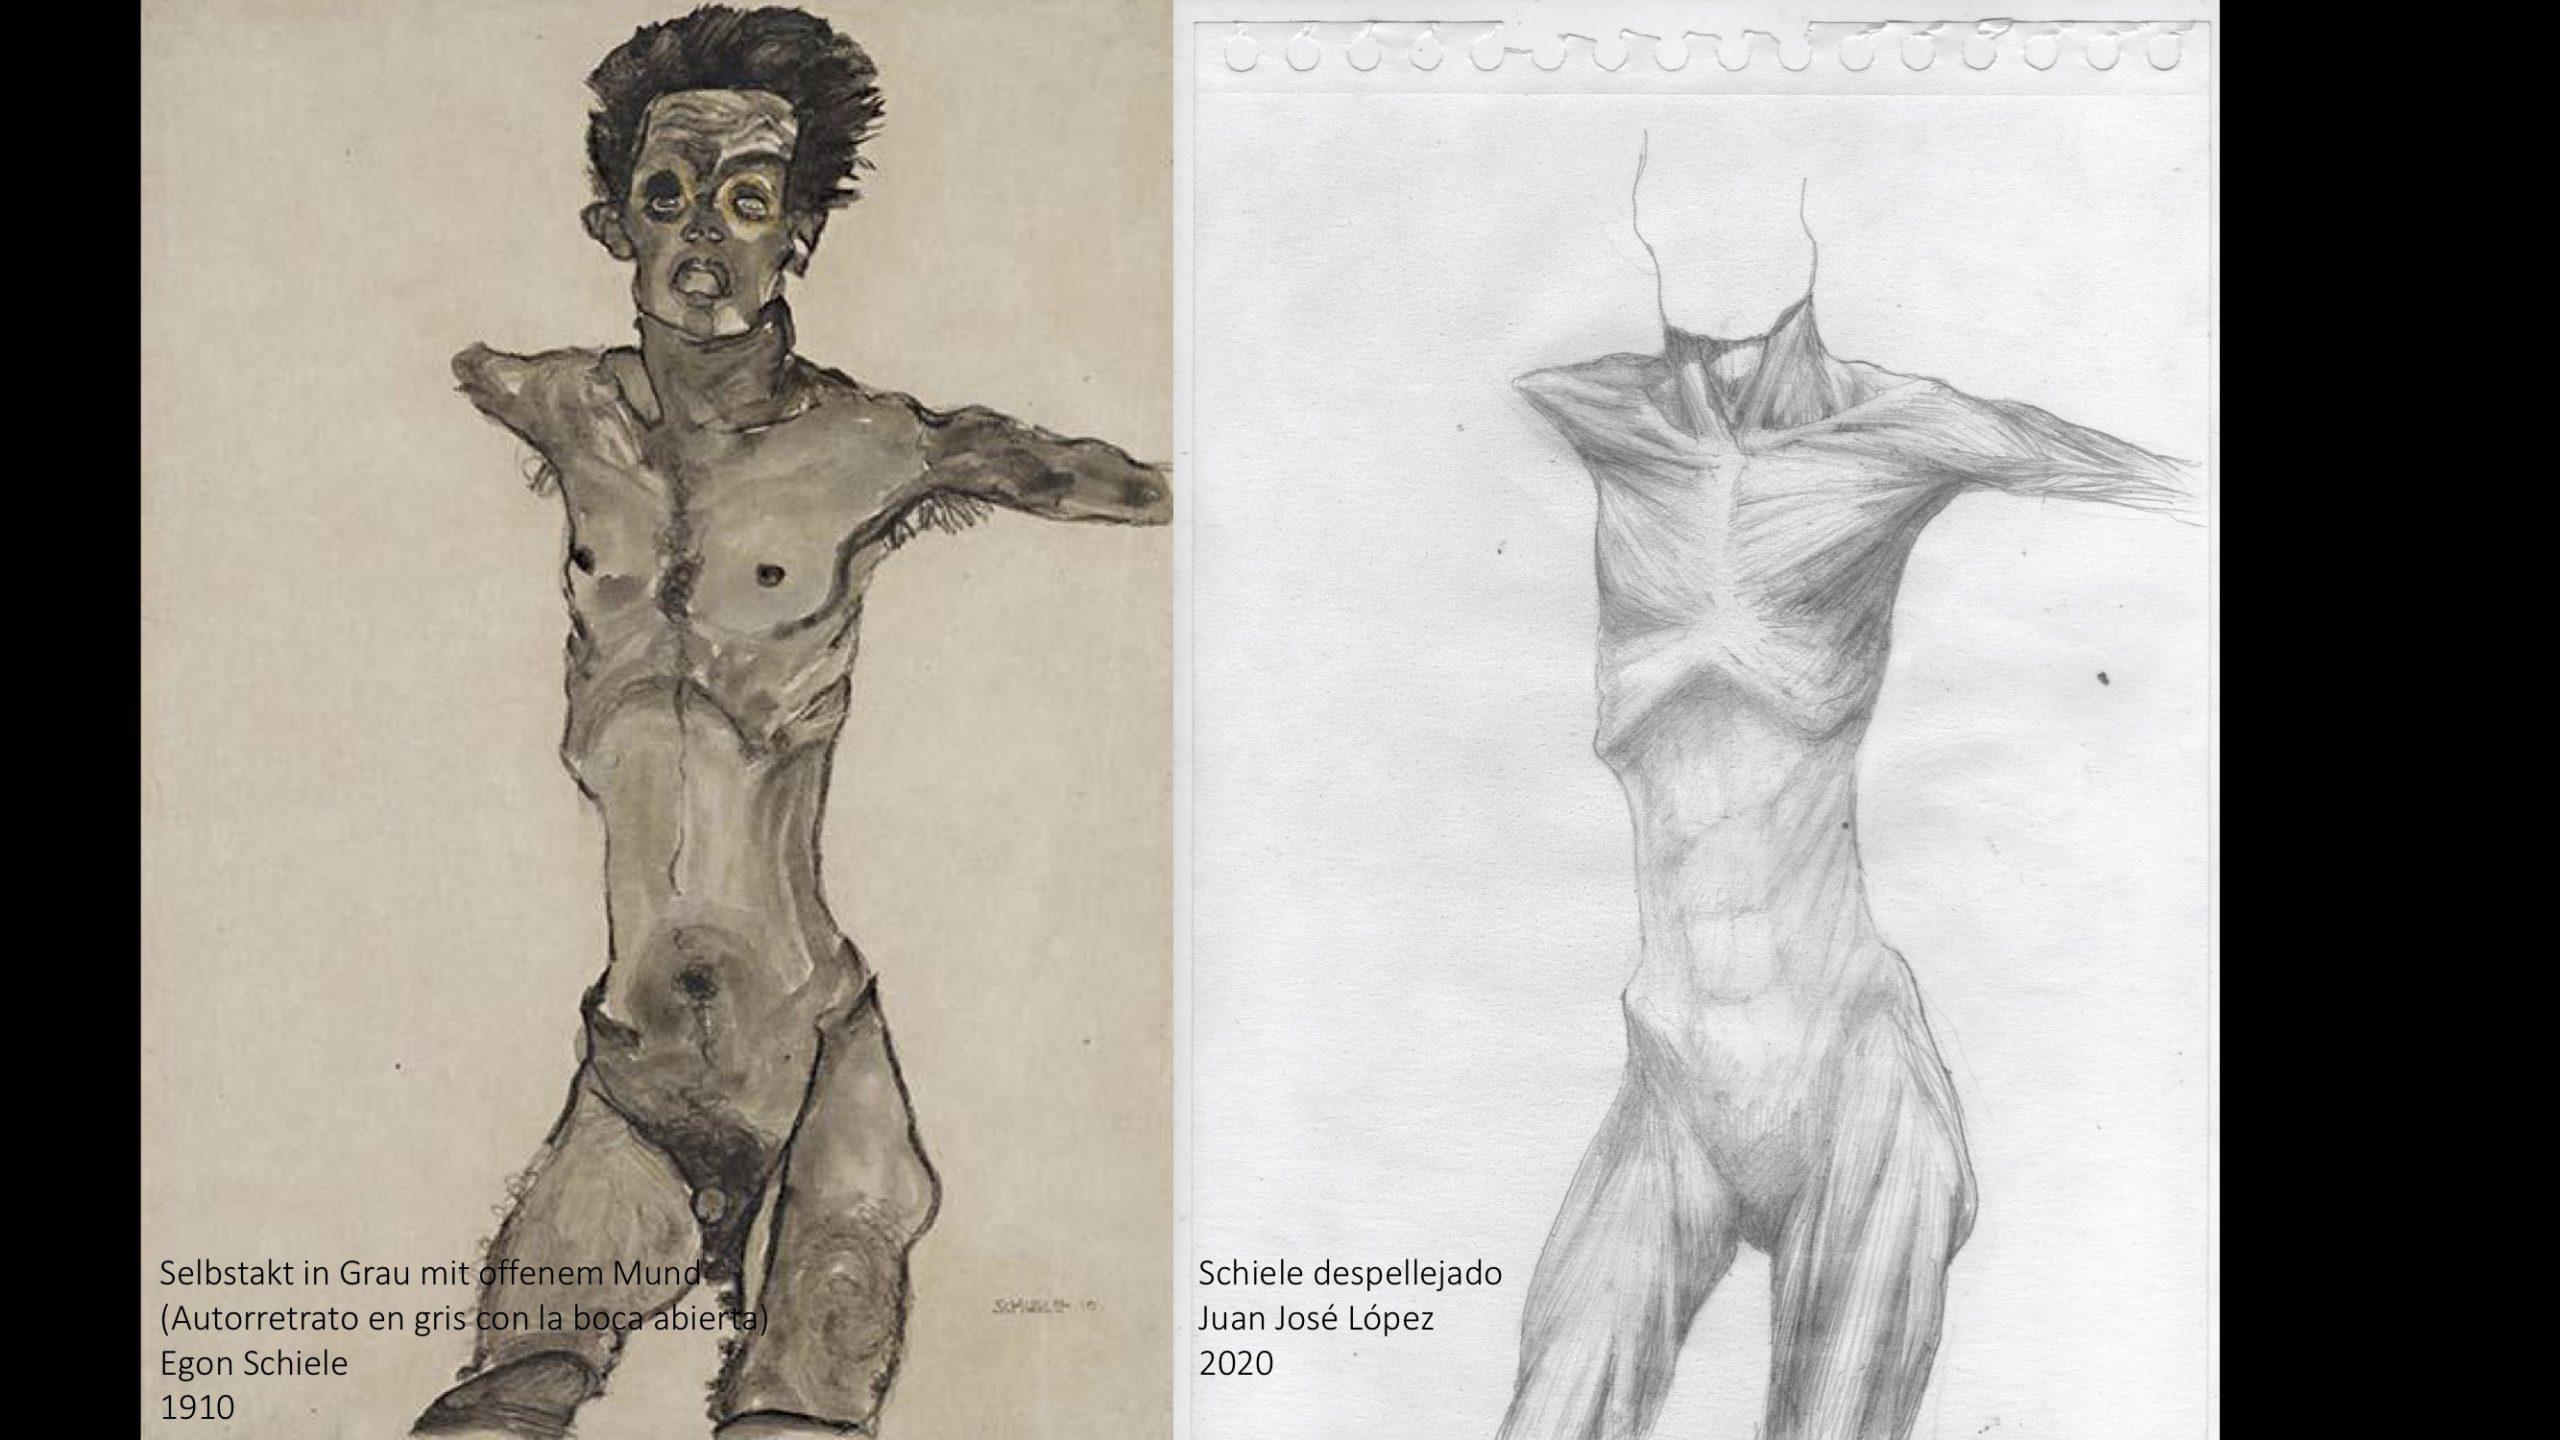 Schiele despellejado – Juan José López